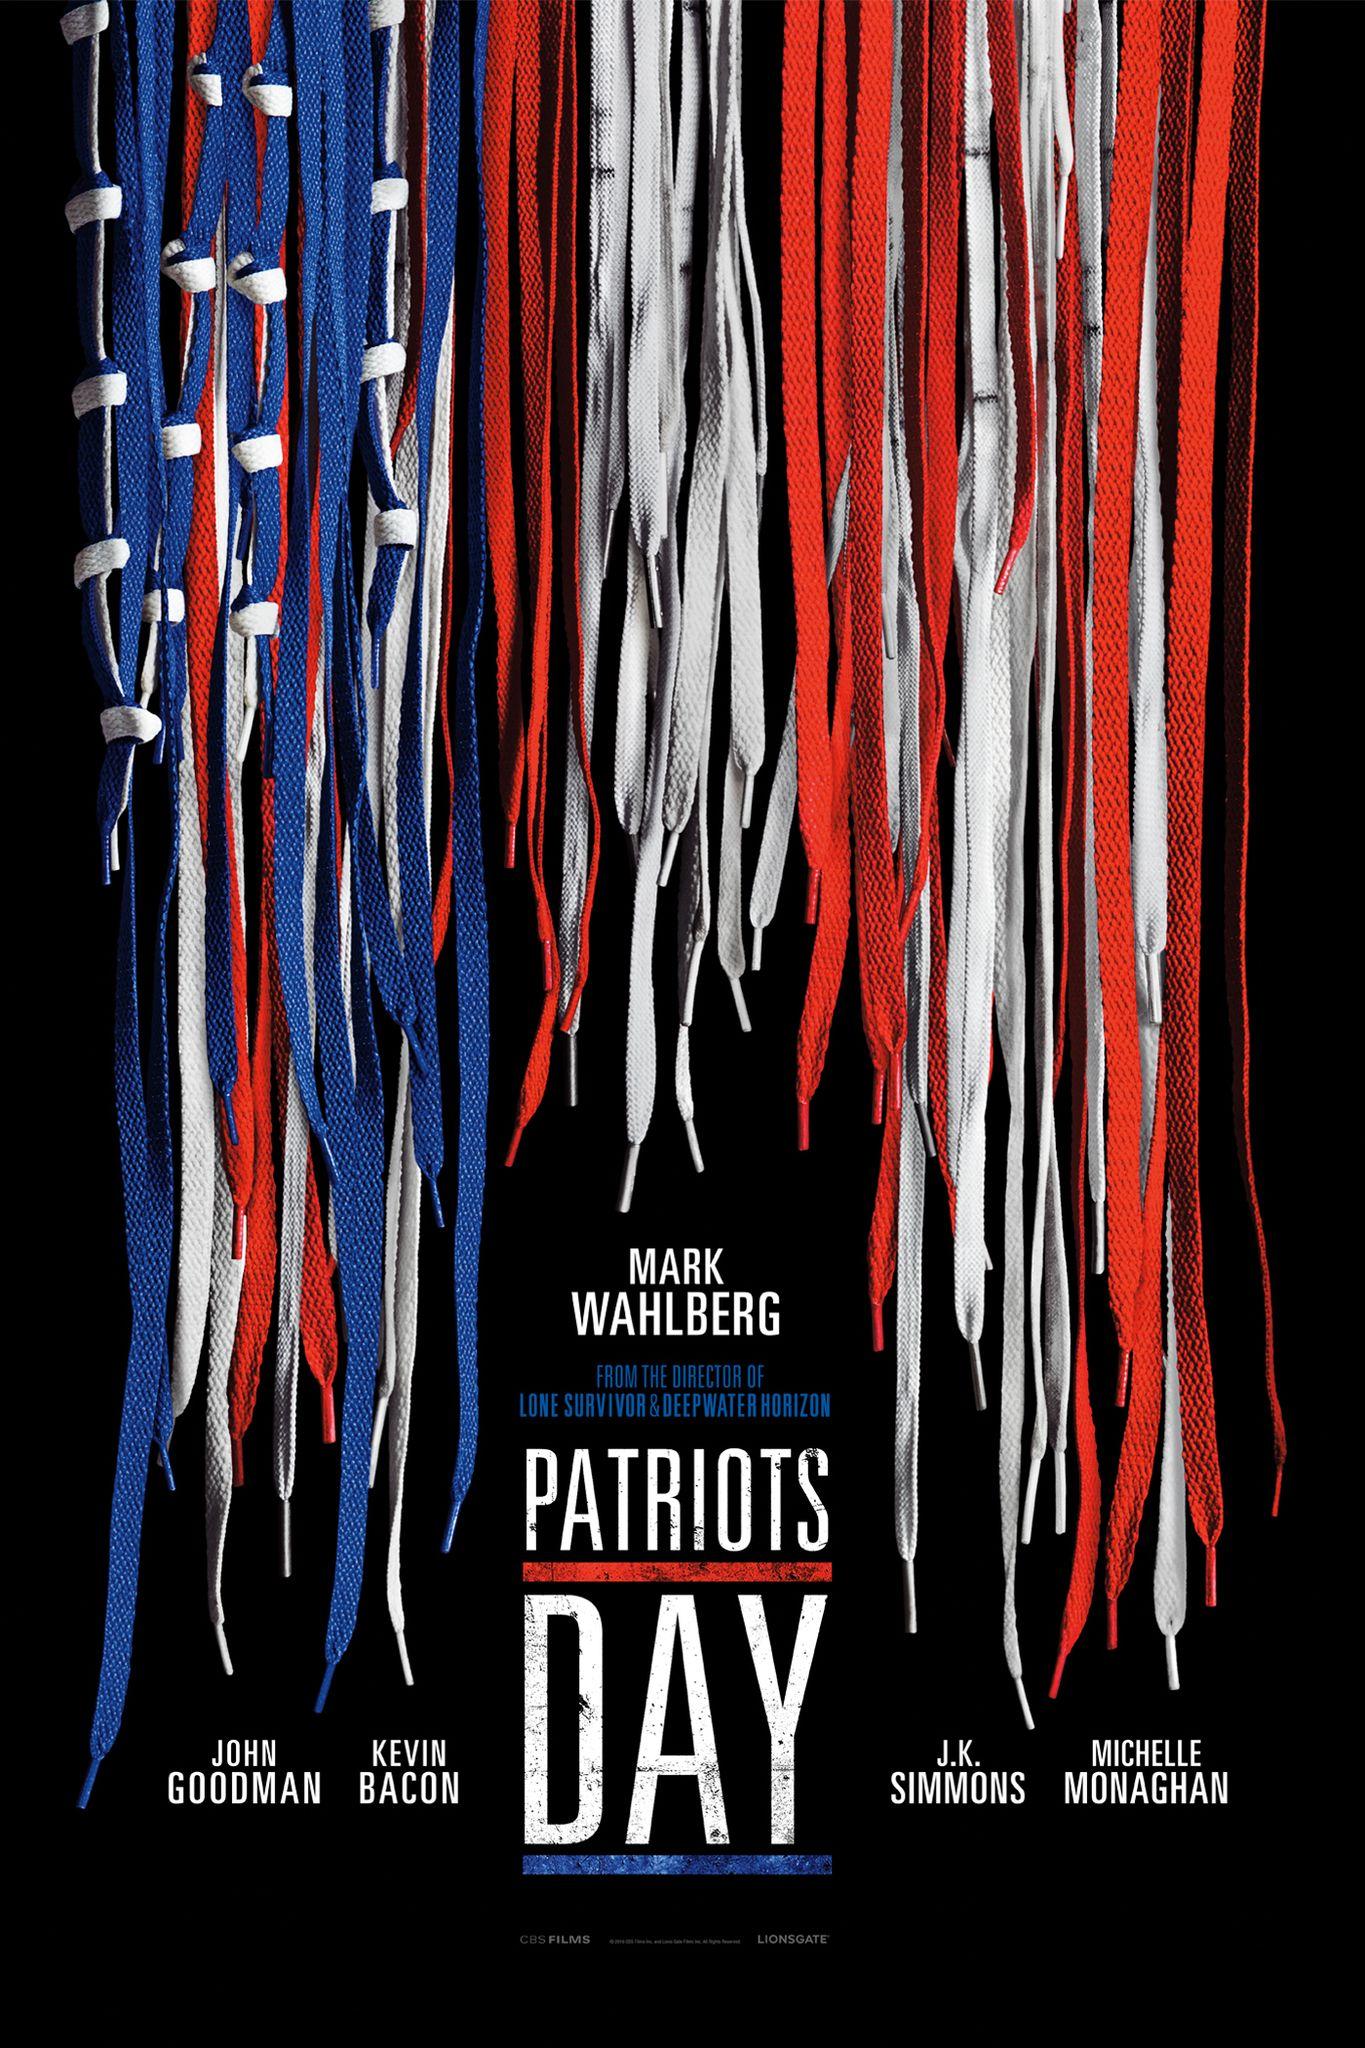 Patriots Day 2016 In 2020 Patriots Day Patriots Day 2016 Mark Wahlberg